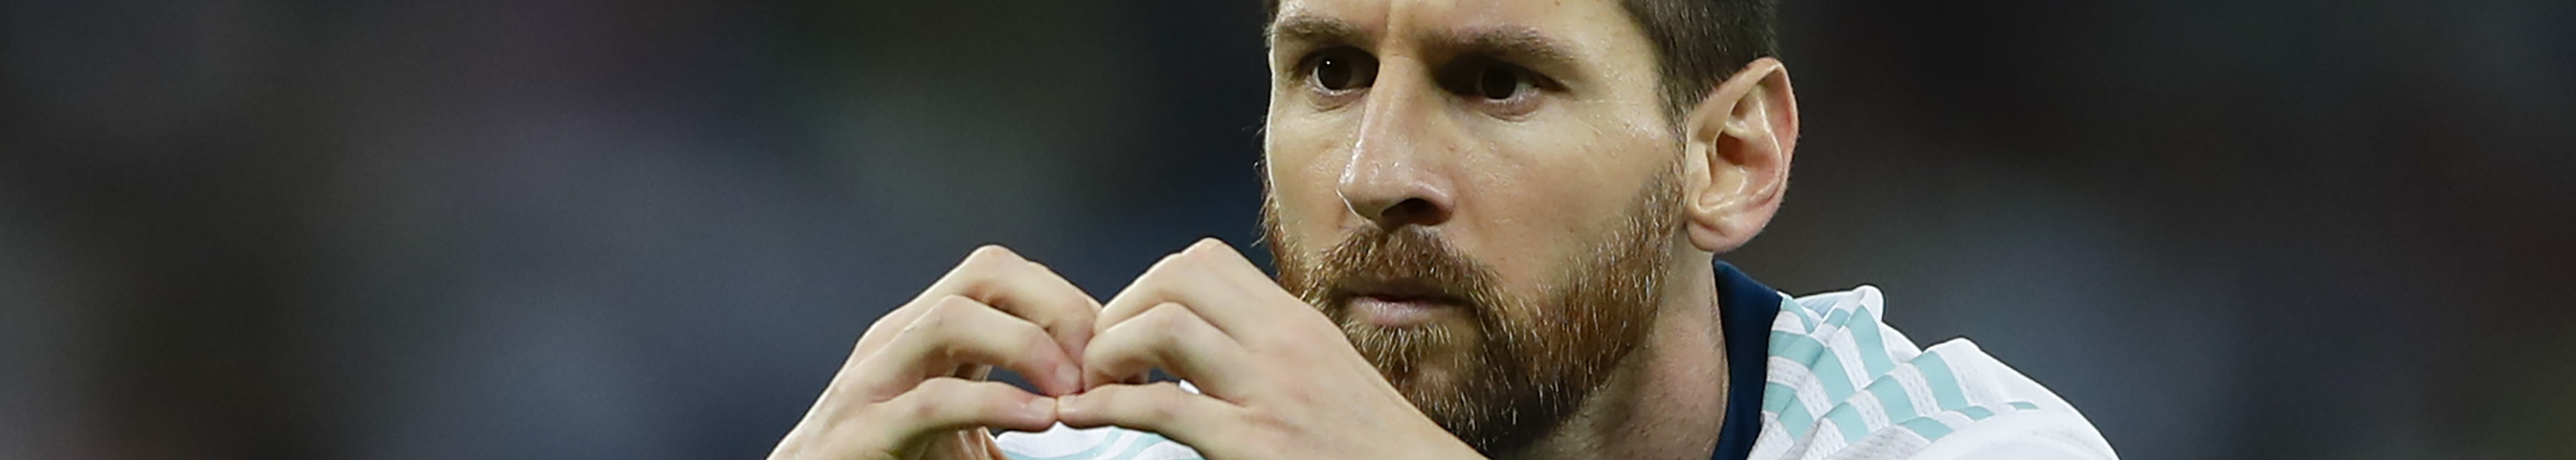 Qatar-Argentina, Messi deve scongiurare un clamoroso flop